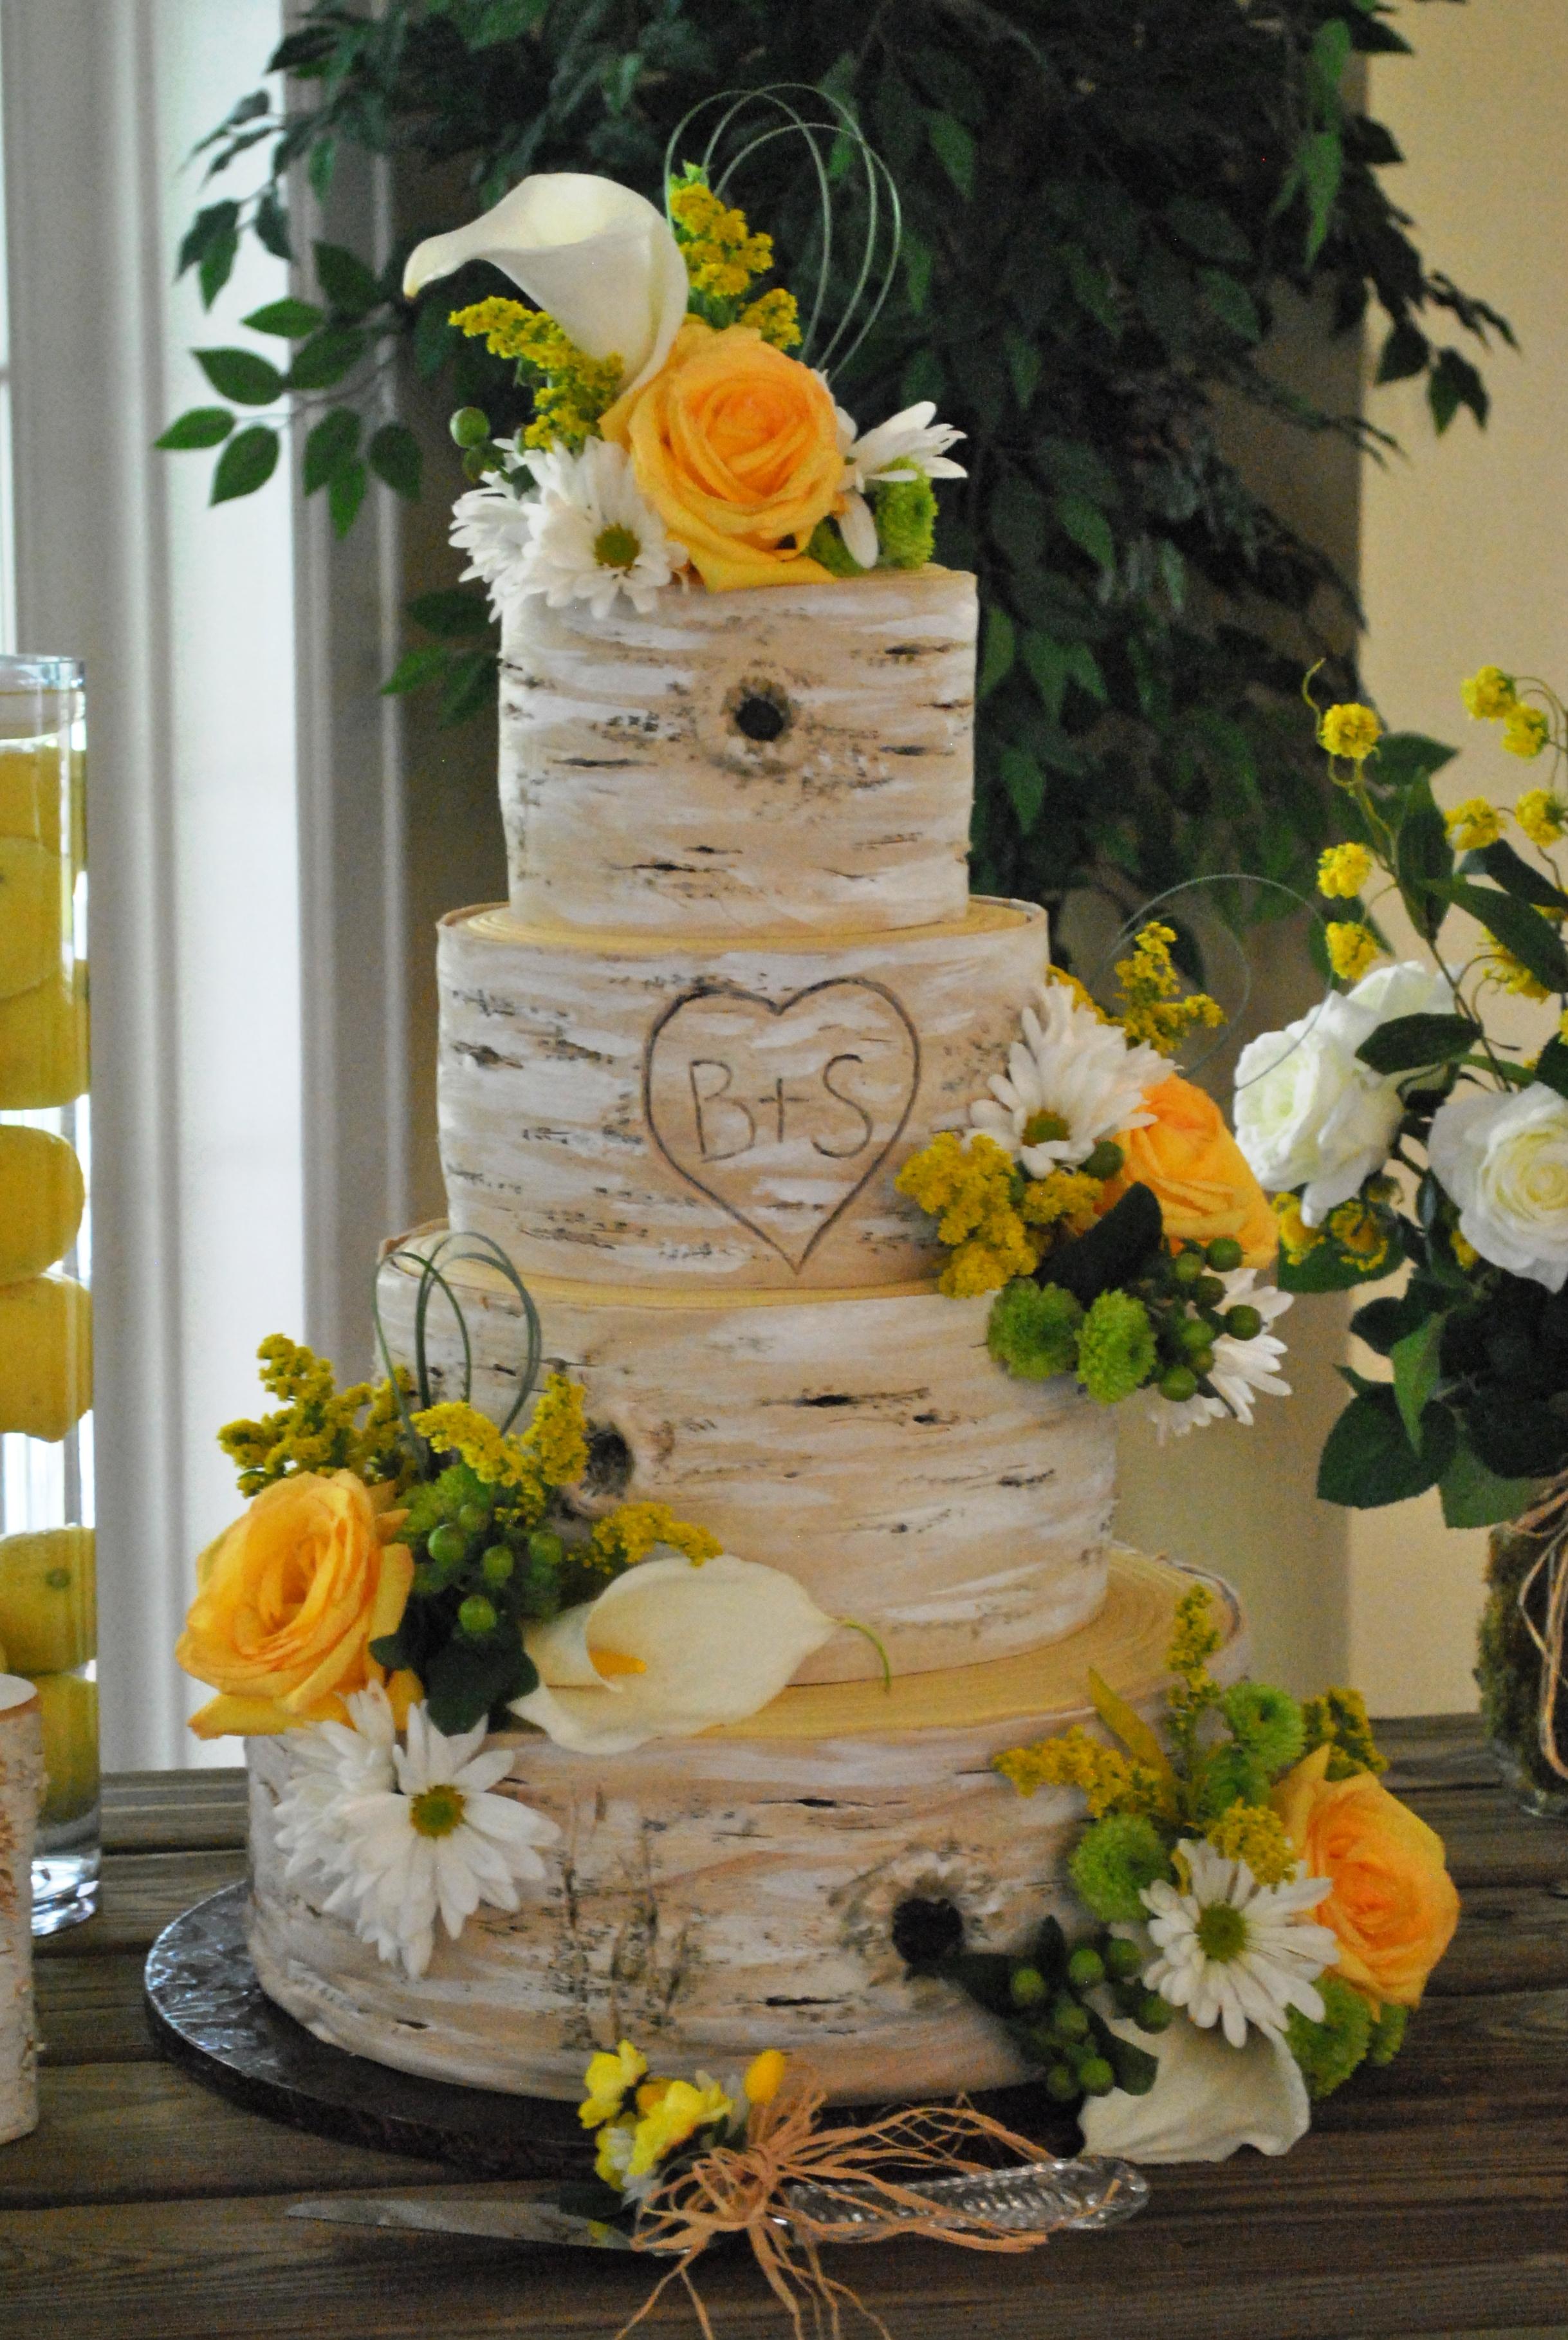 Tree Wedding Cakes - Wedding Cake Flavors